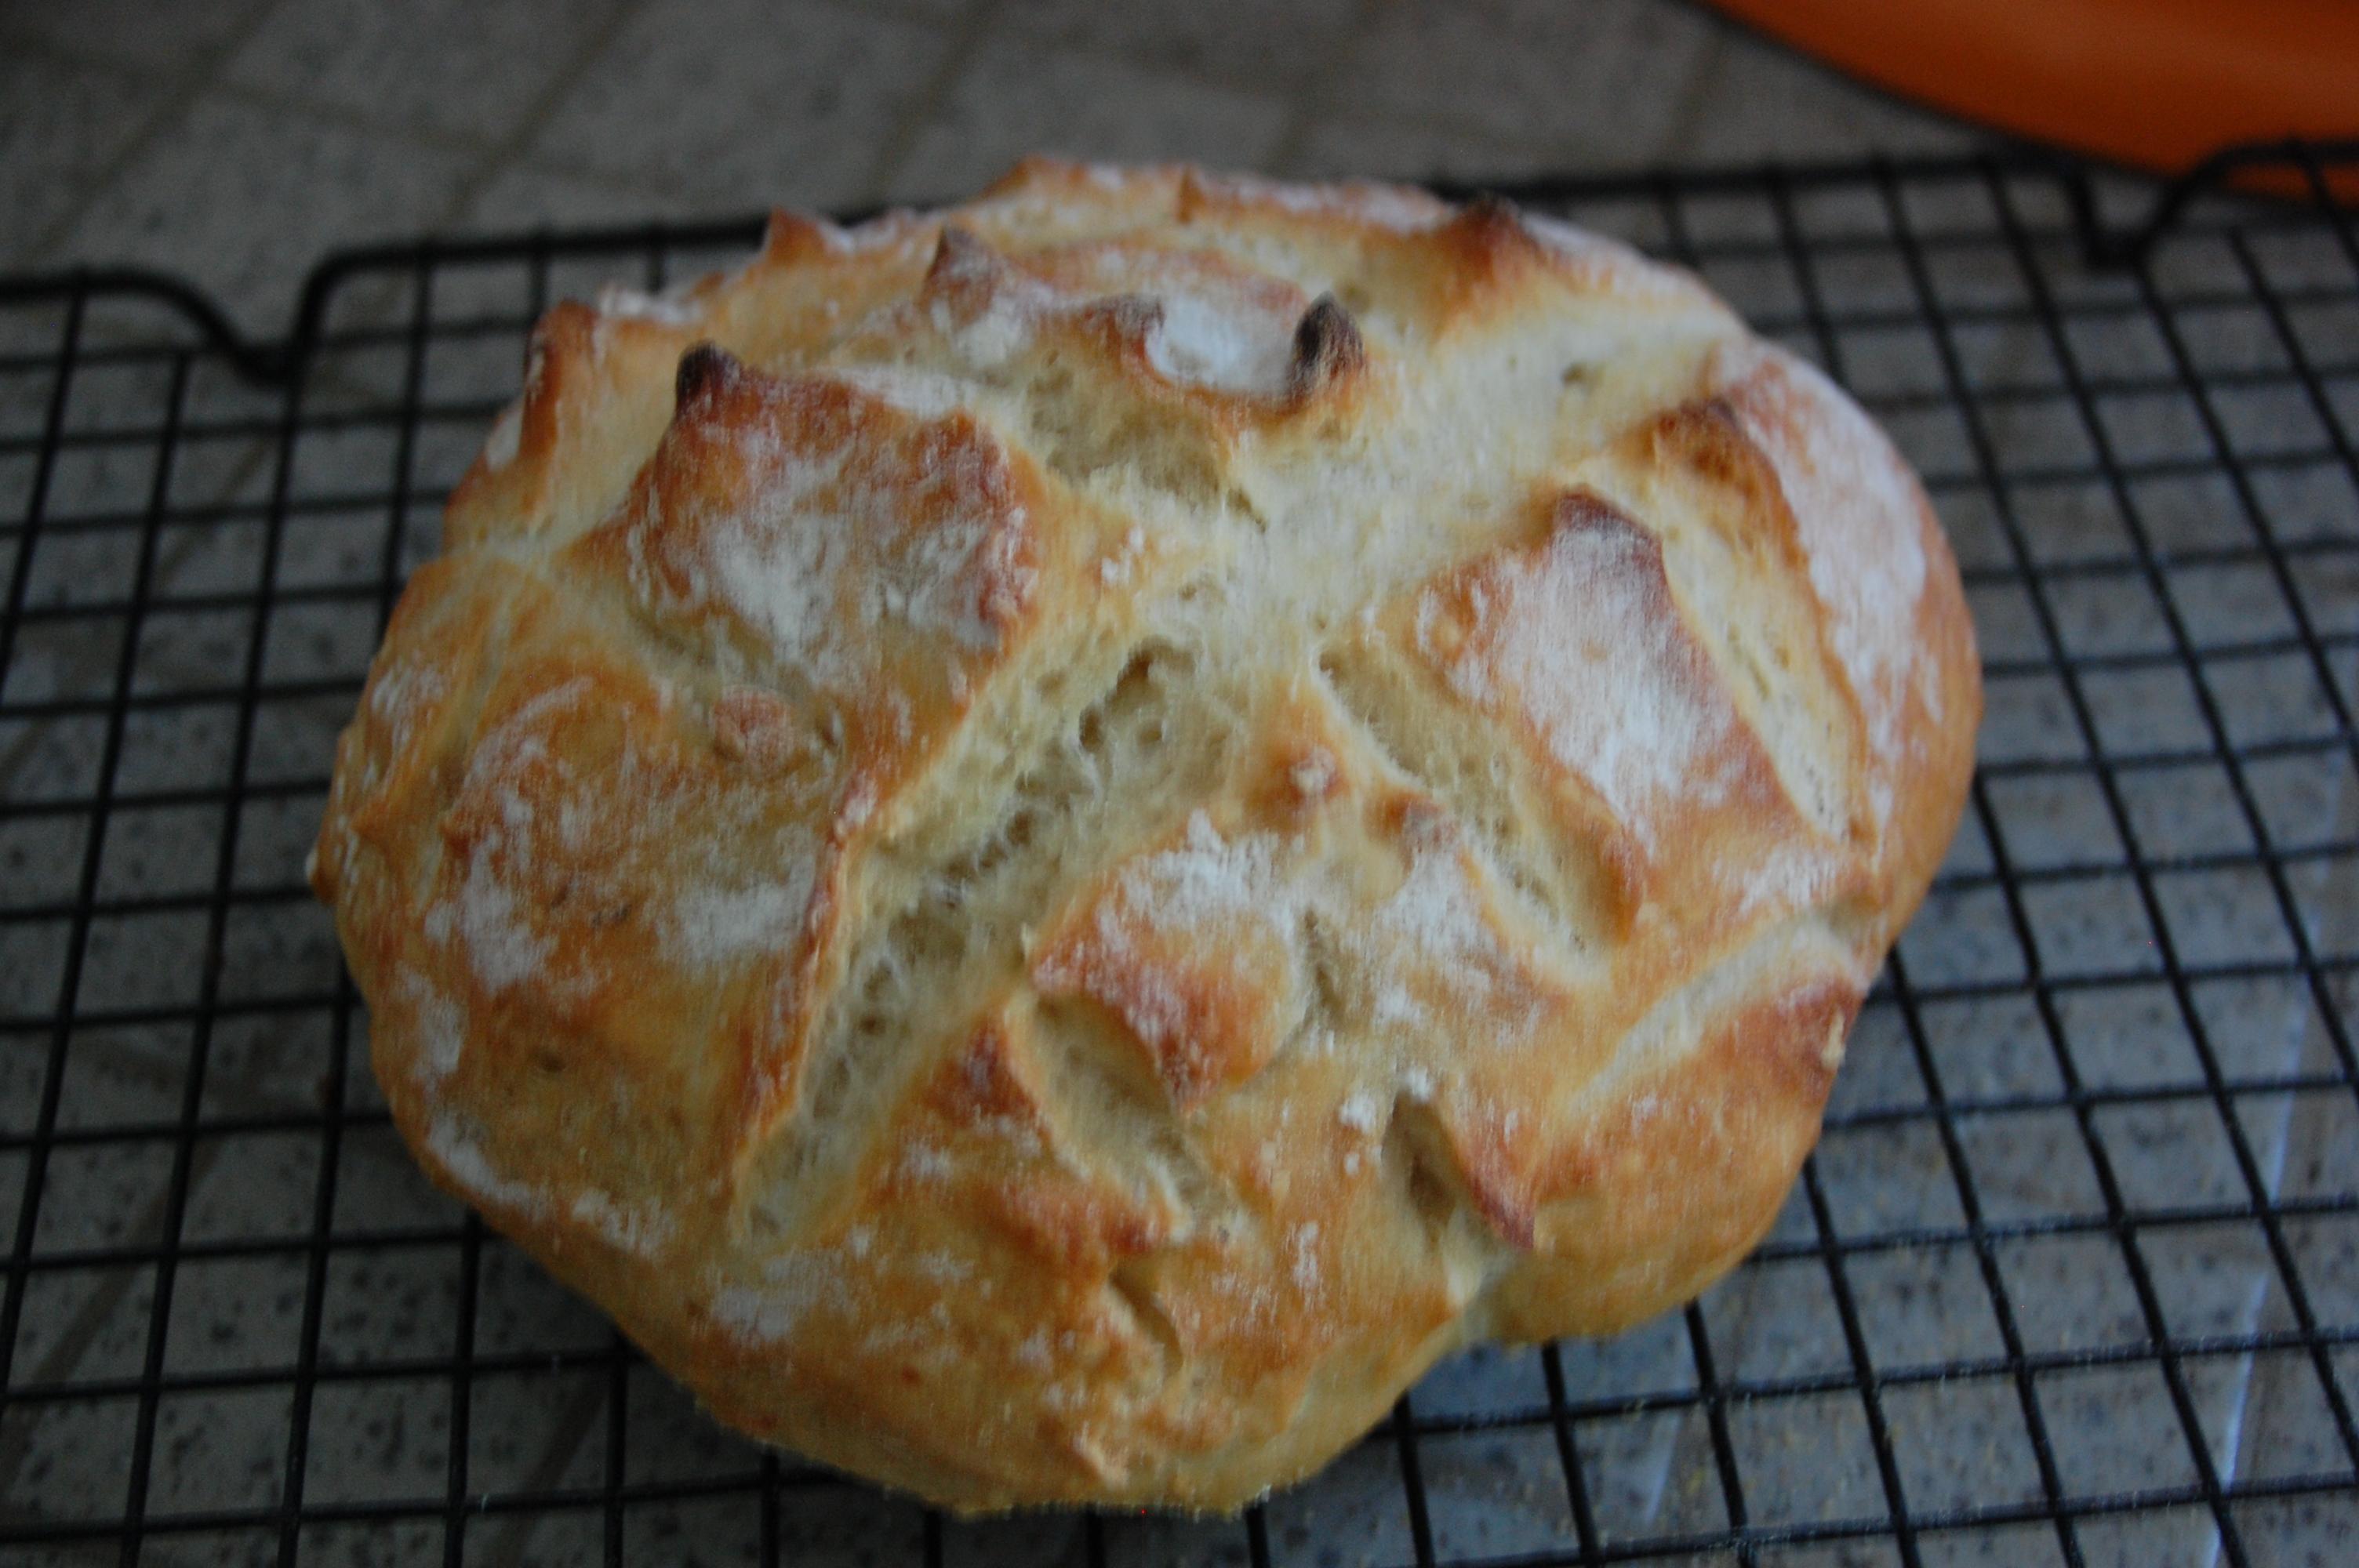 baking n stuff 004